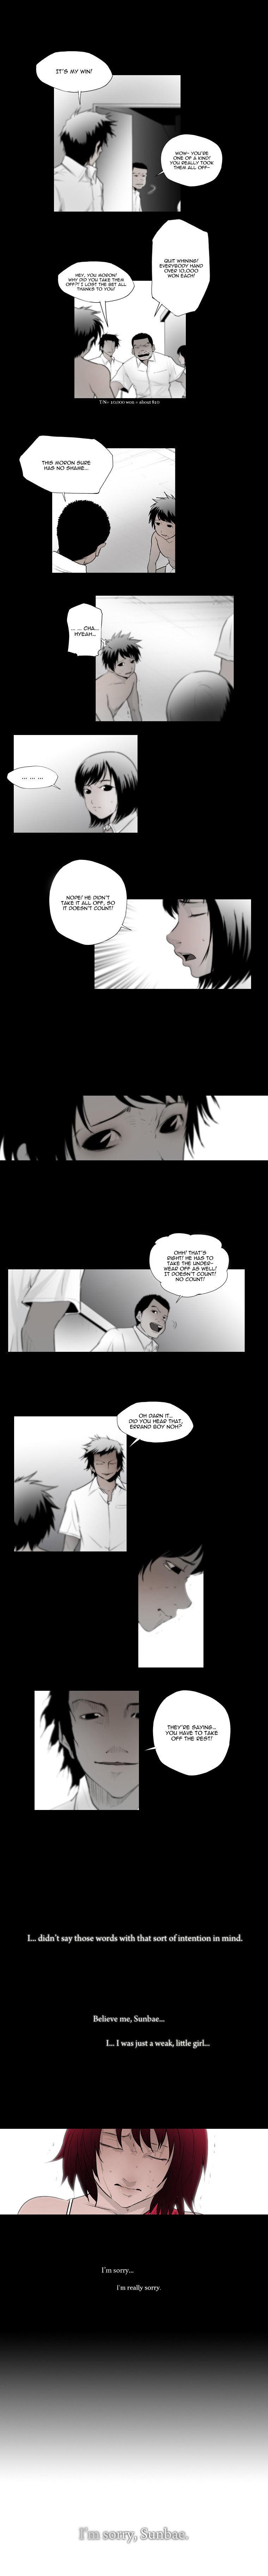 Banquet Box 21 Page 4